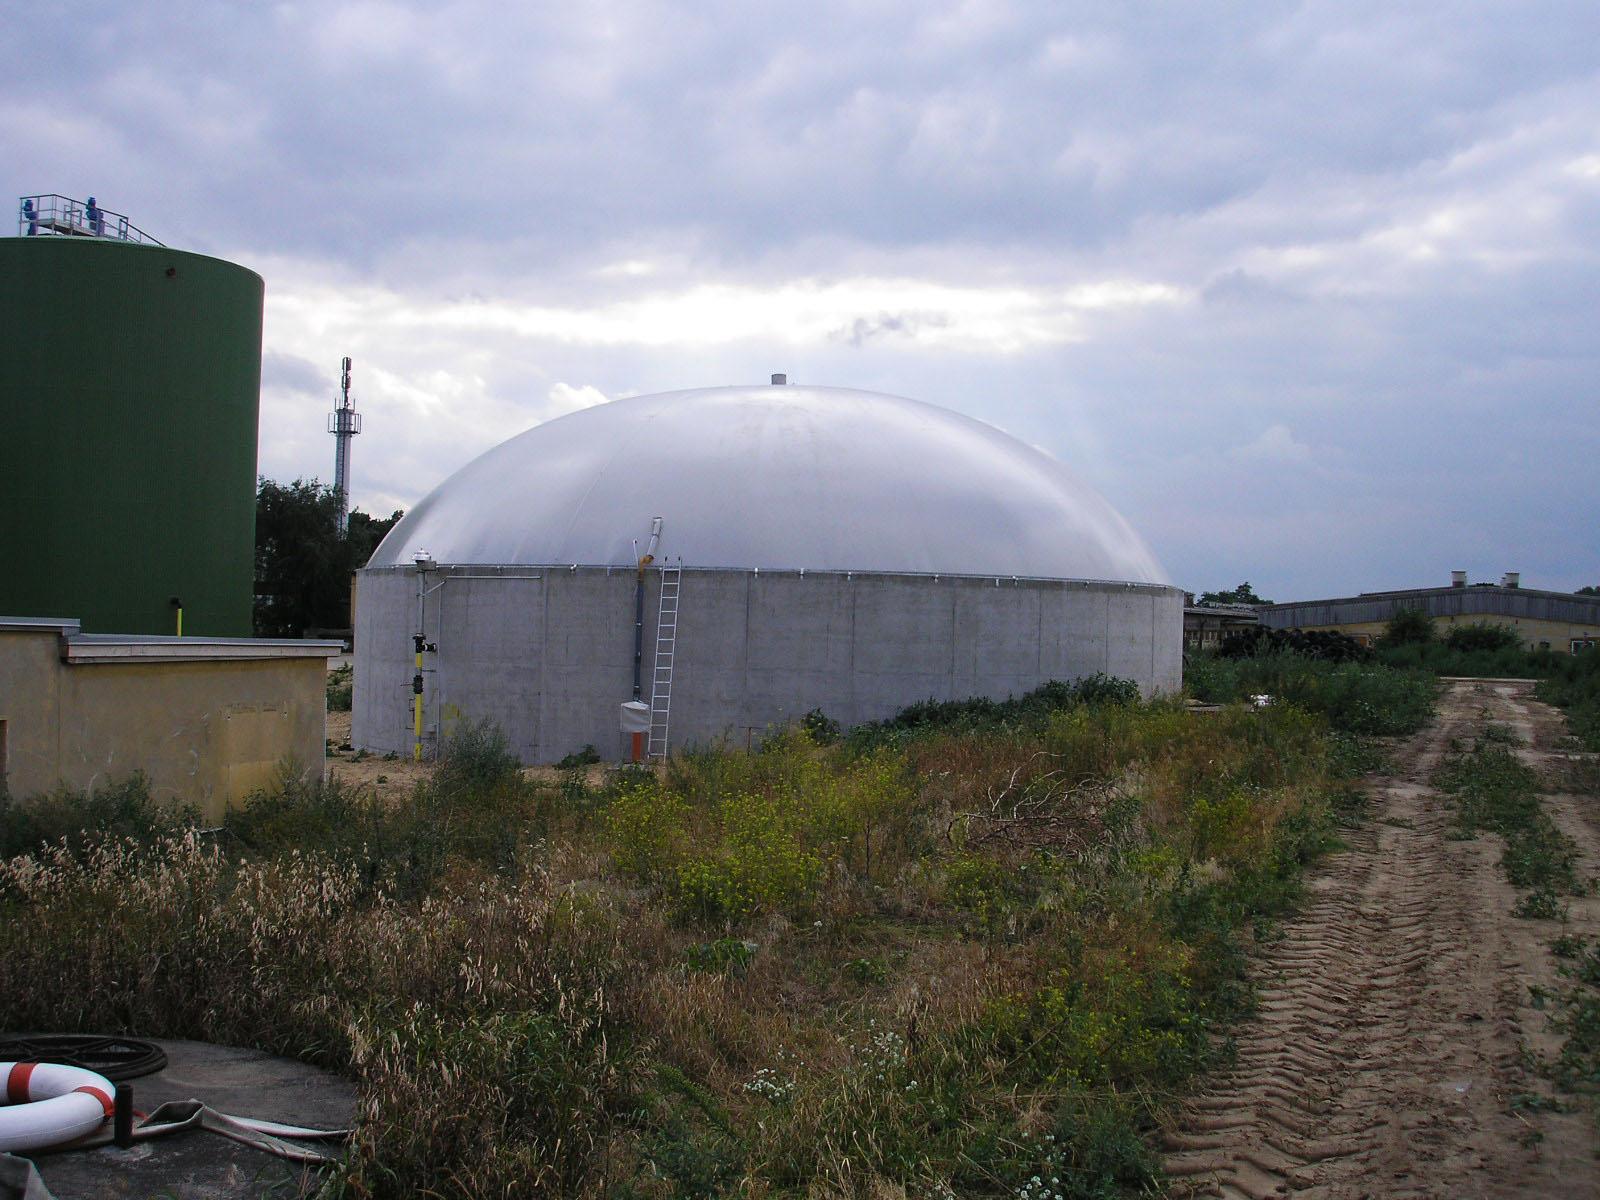 Biogaslager - Berlin